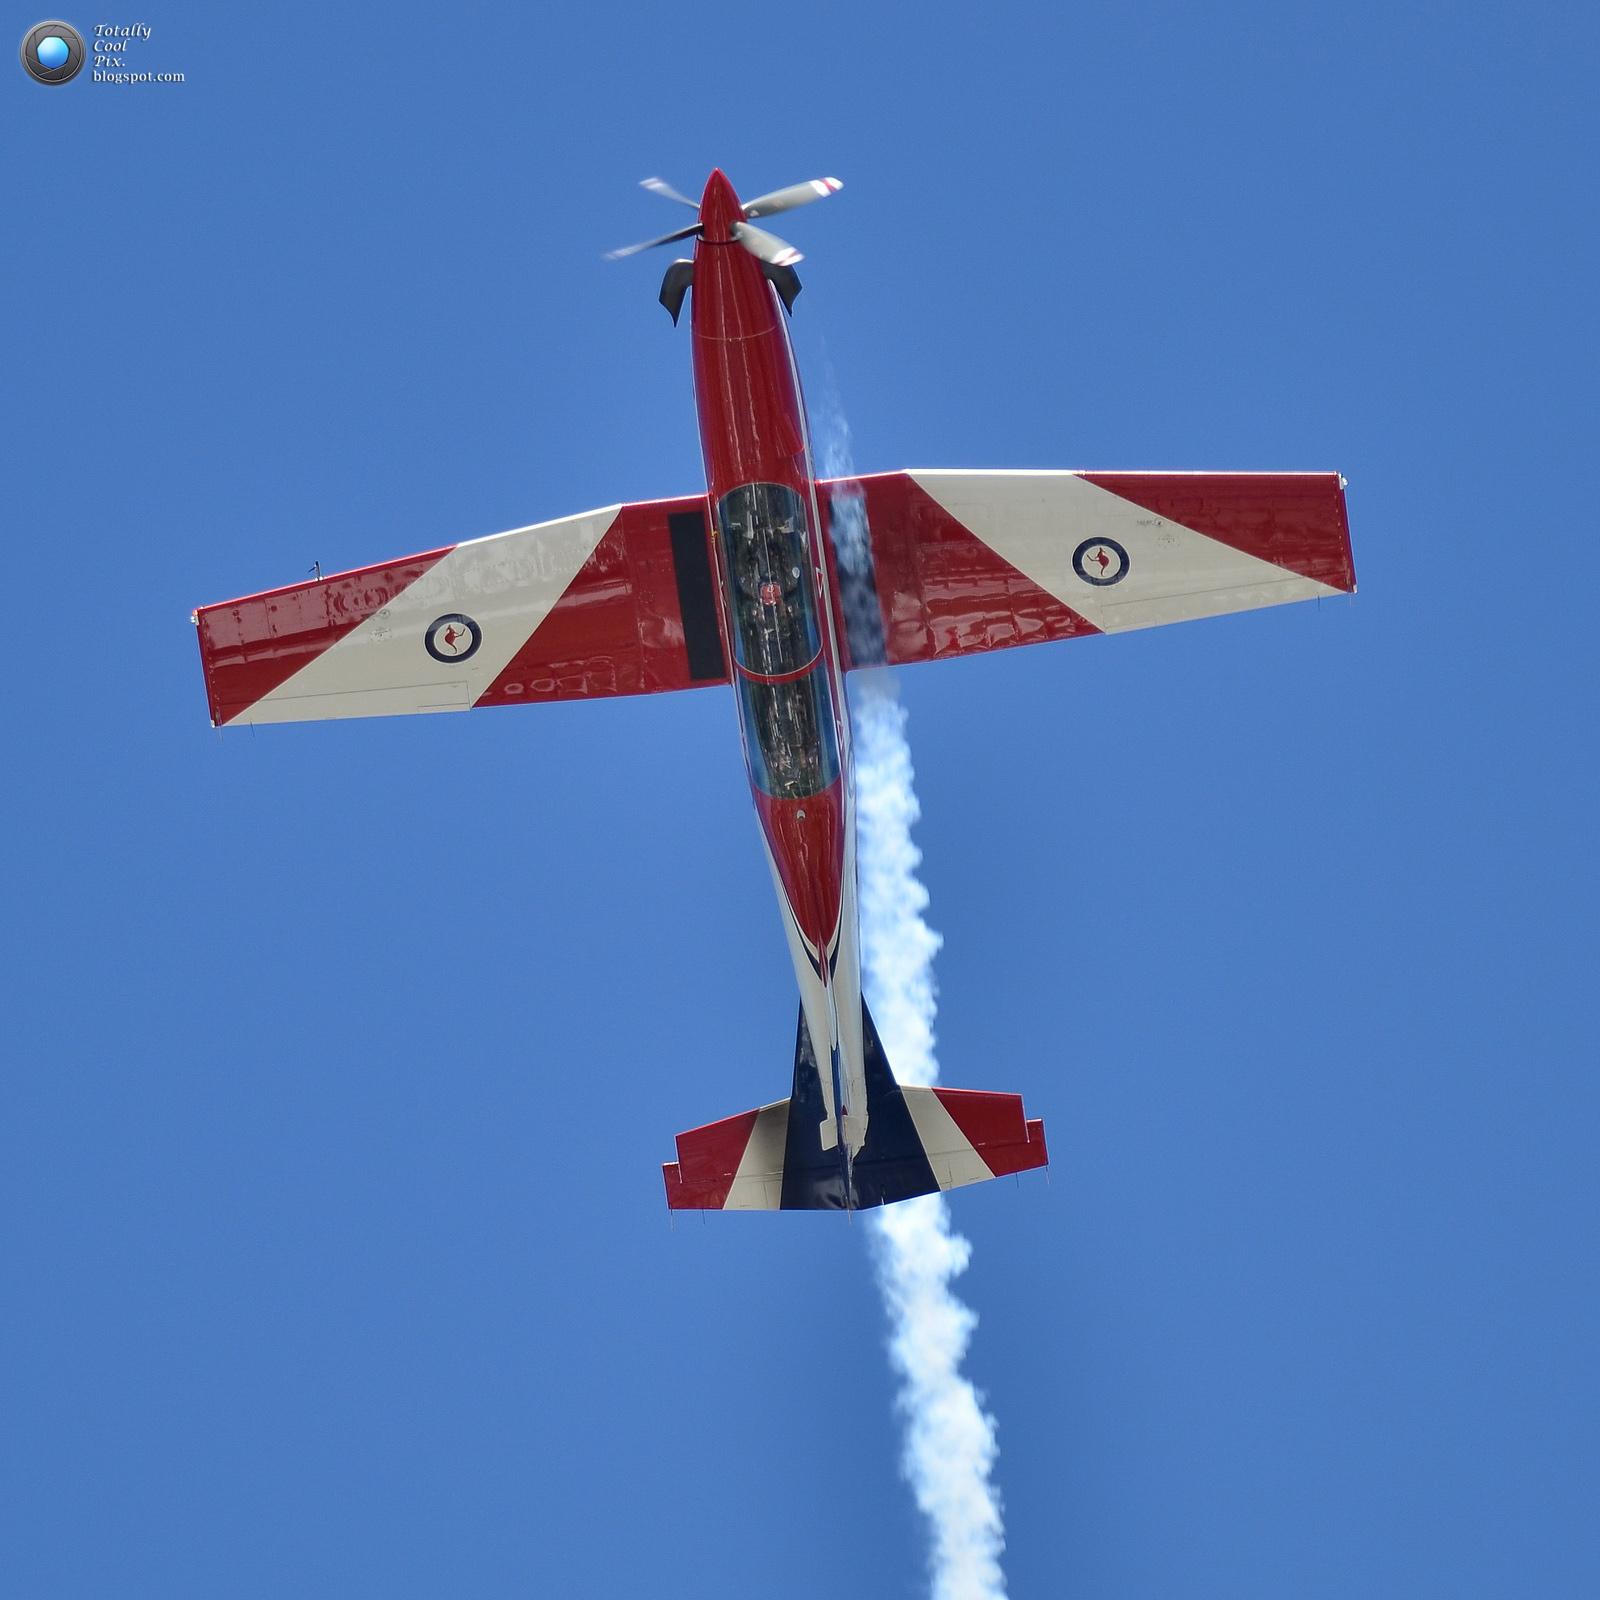 http://3.bp.blogspot.com/-Dq27aWrUqz4/T9xW--Ub5iI/AAAAAAAABVo/GxI2GCnzoZg/s1600/3-Australia-2012-F1-Grand-Prix-Airshow-Wallpaper-Keith-McInnes-Photography-Roulettes-single.jpg